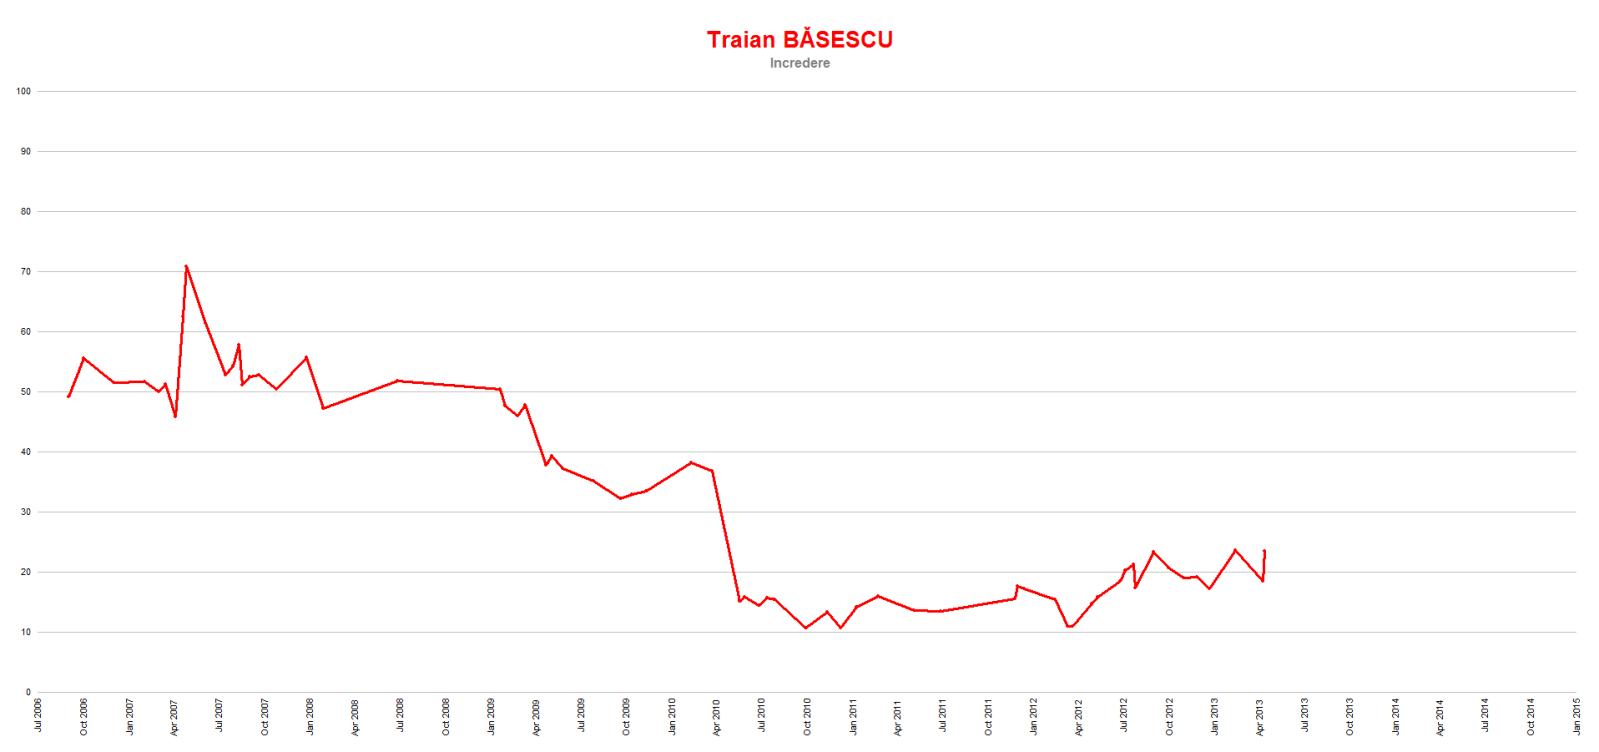 Evolutia lui Traian Basescu